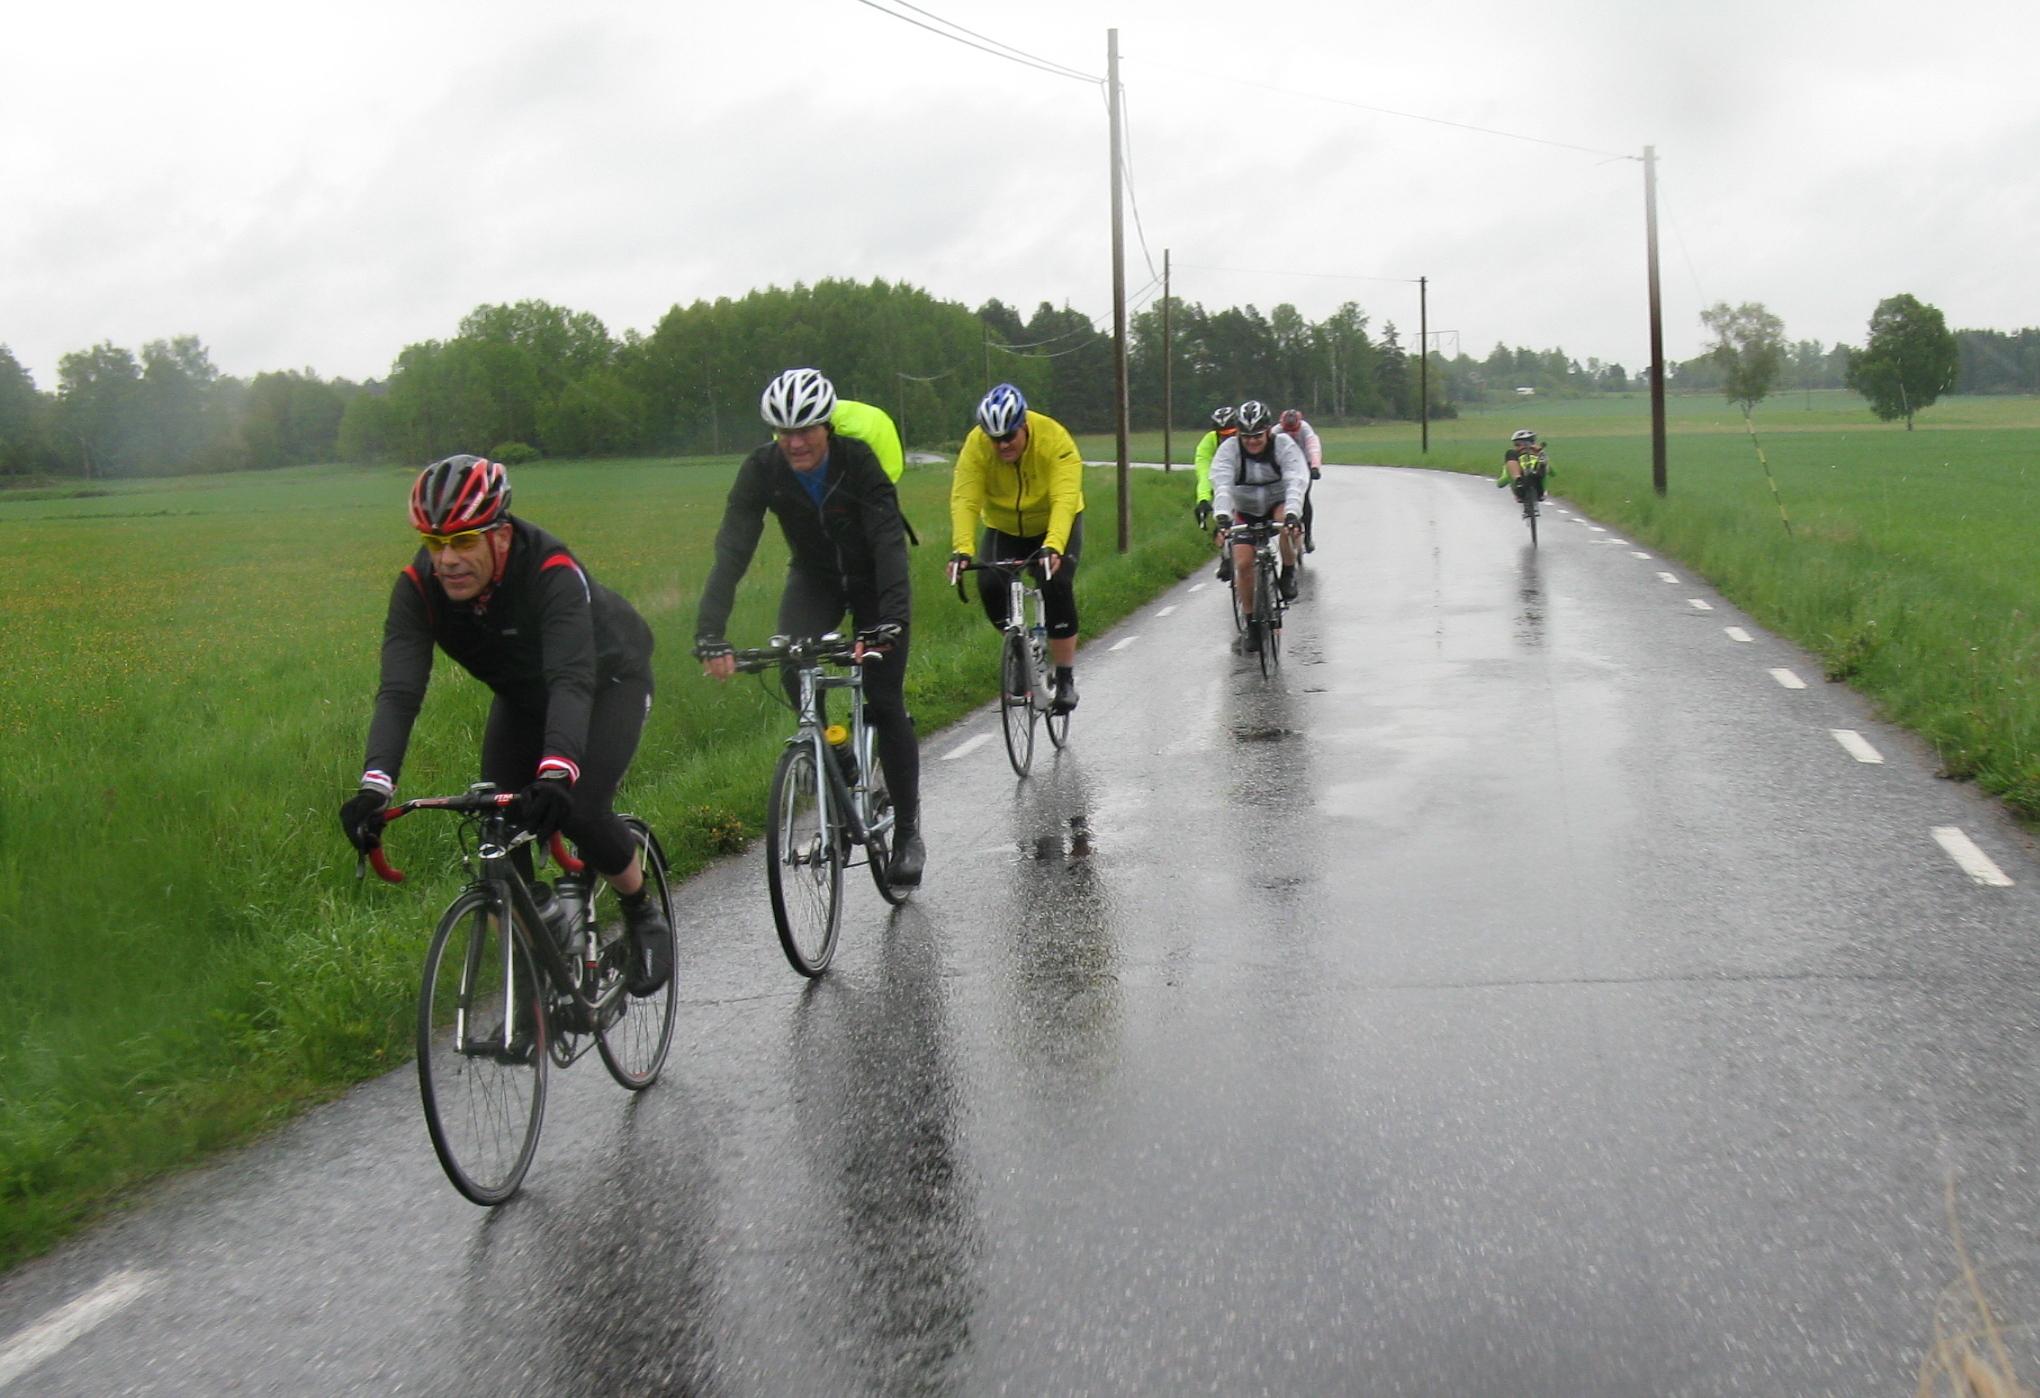 Audax rain